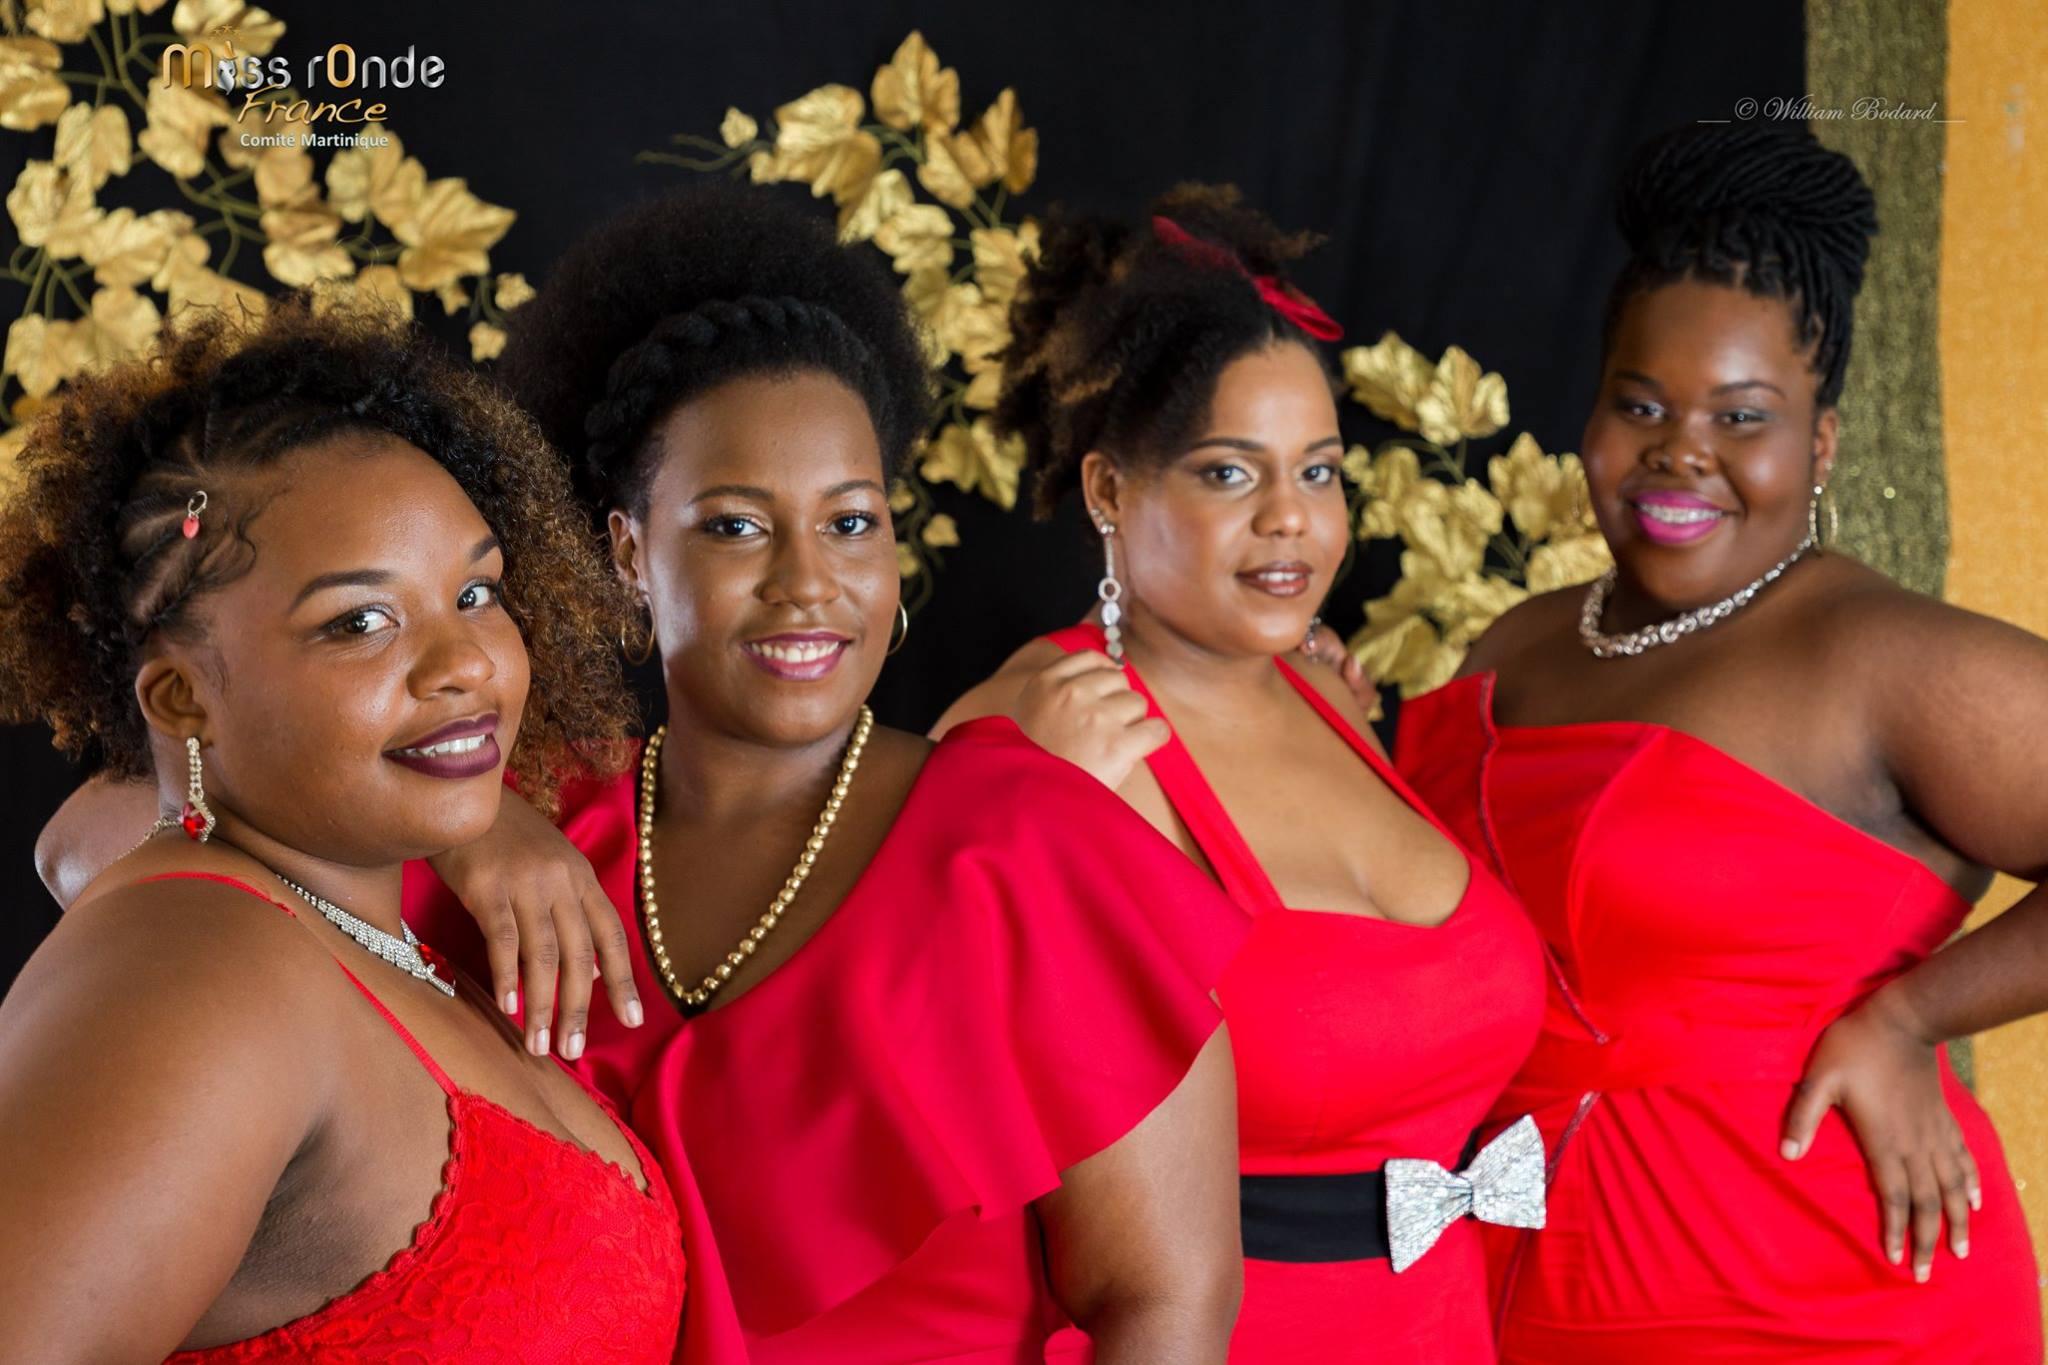 concours miss ronde comite Martinique 2018 candidates¨Priscilla Samantha Annaelle Klarys.jpg